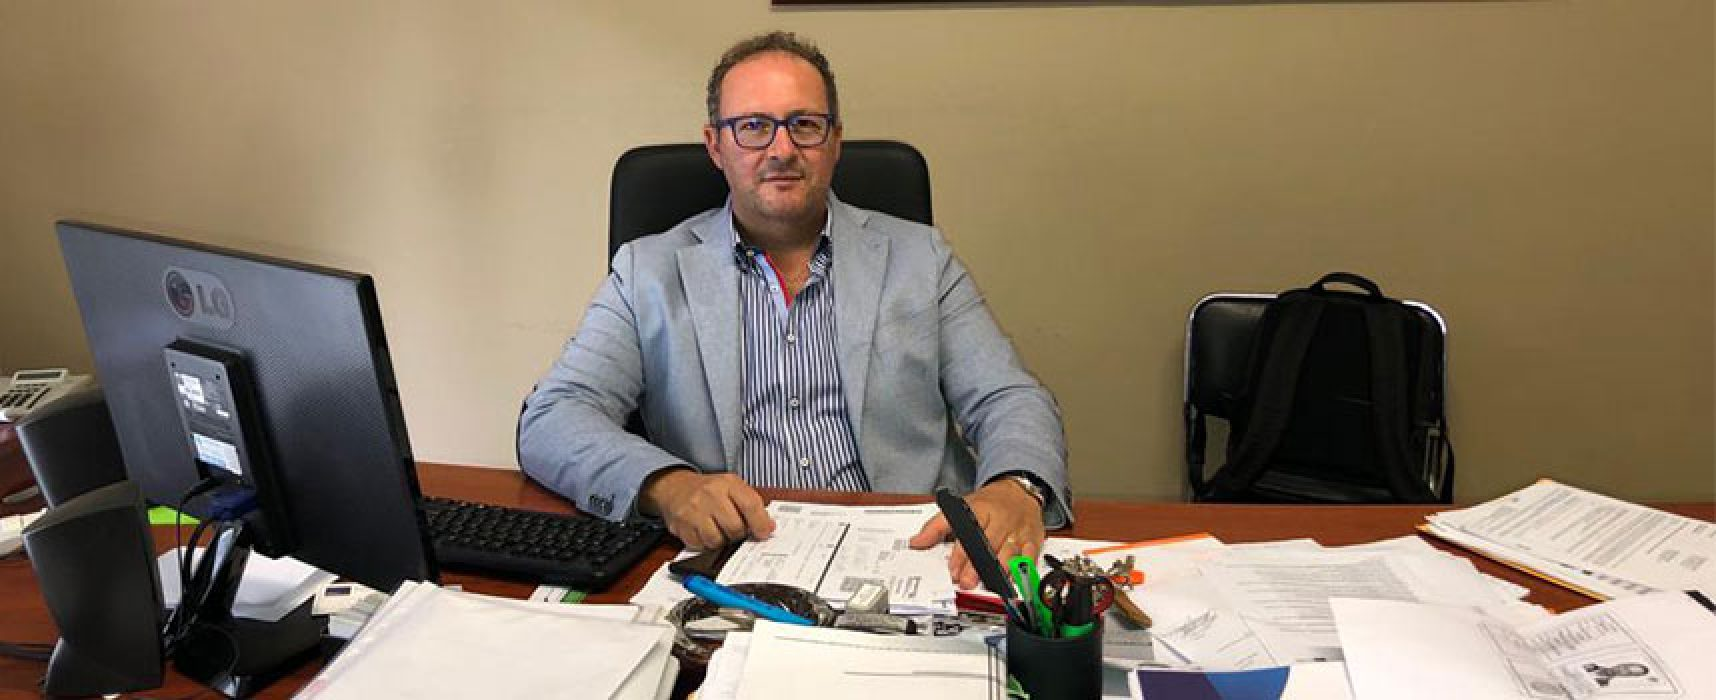 Bisceglie Femminile, assemblea nomina Francesco   La Notte presidente